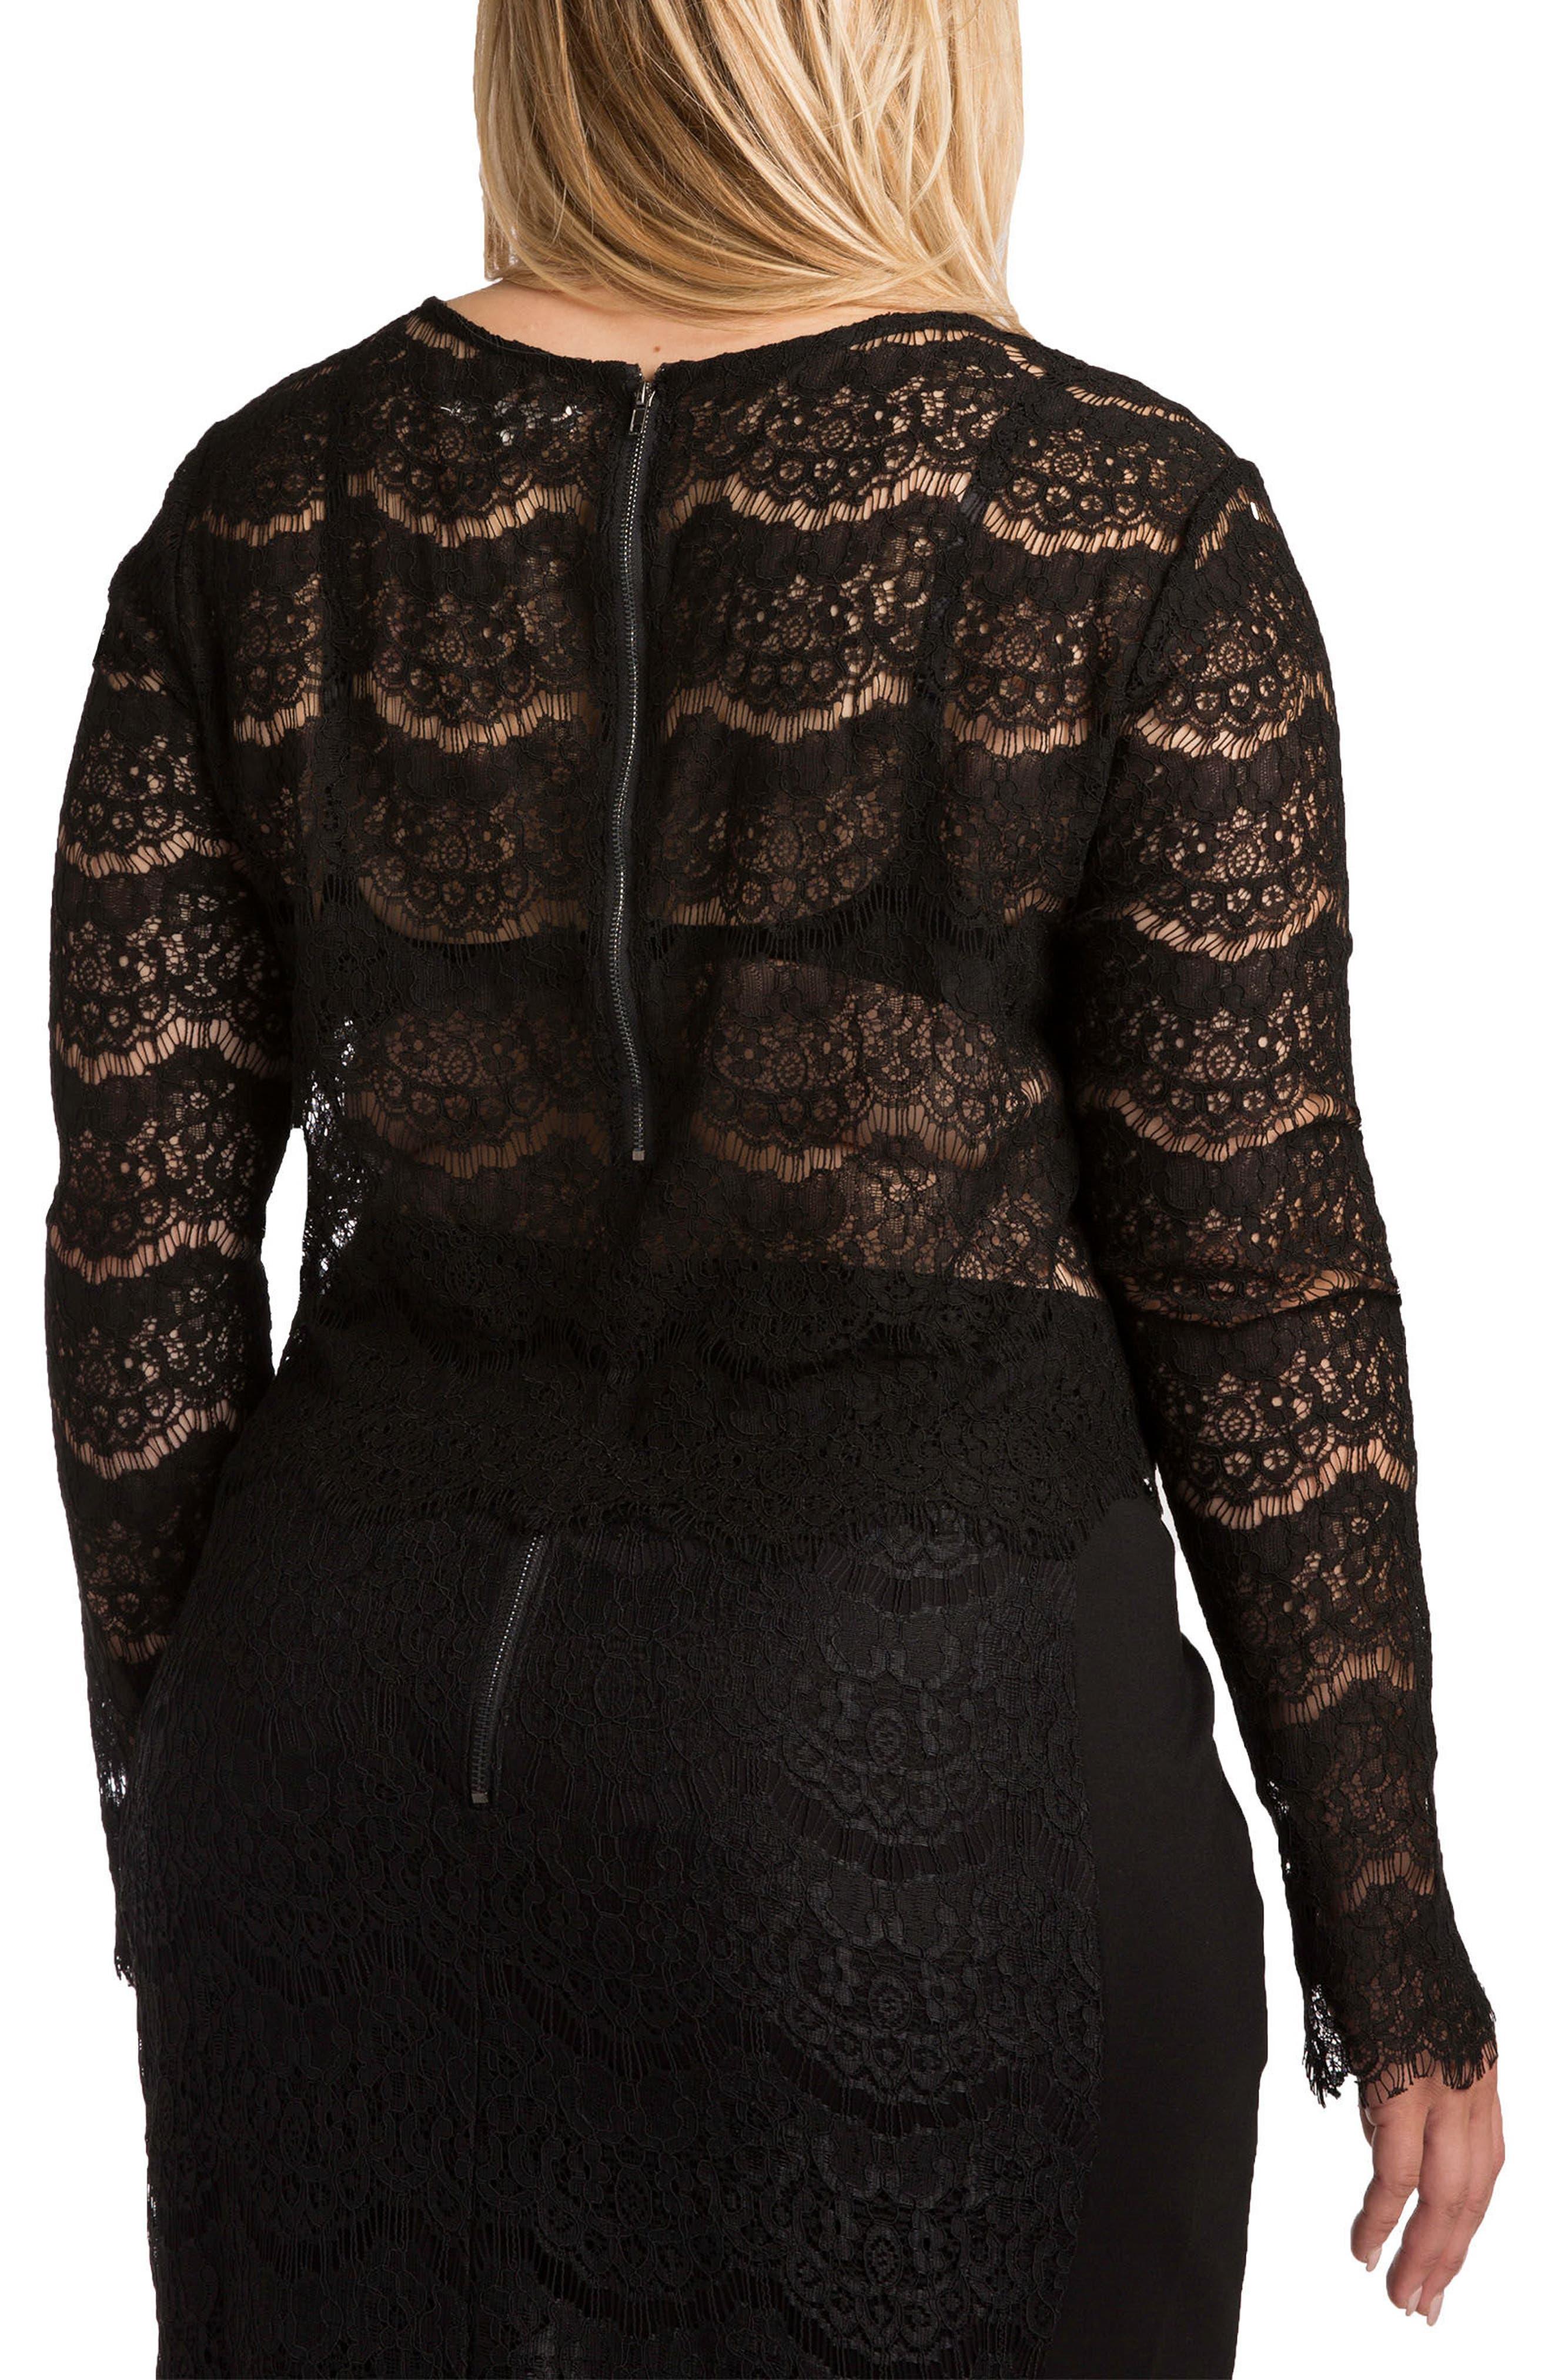 Sydney Lace Skimmer Top,                             Alternate thumbnail 2, color,                             BLACK